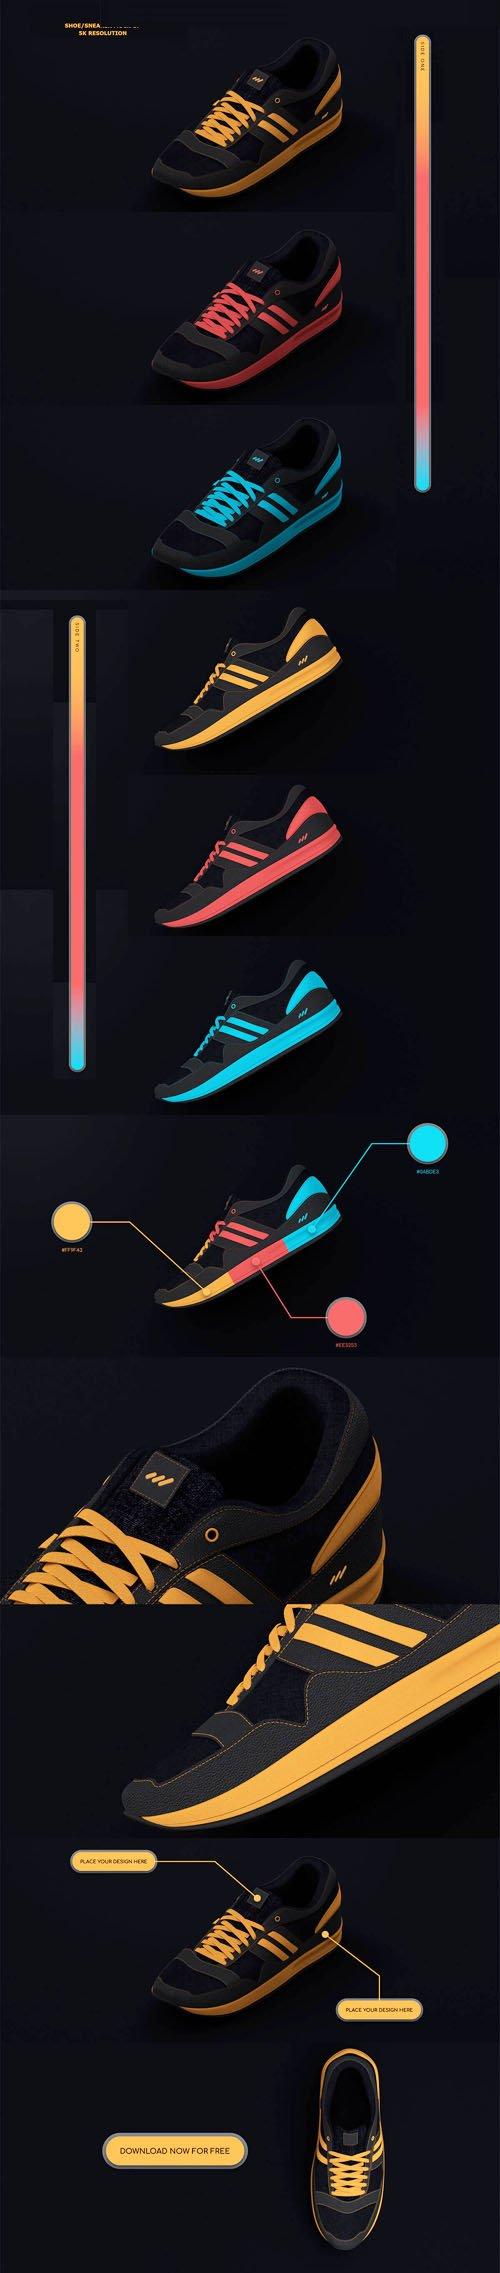 Shoe Sneakers PSD Mockups